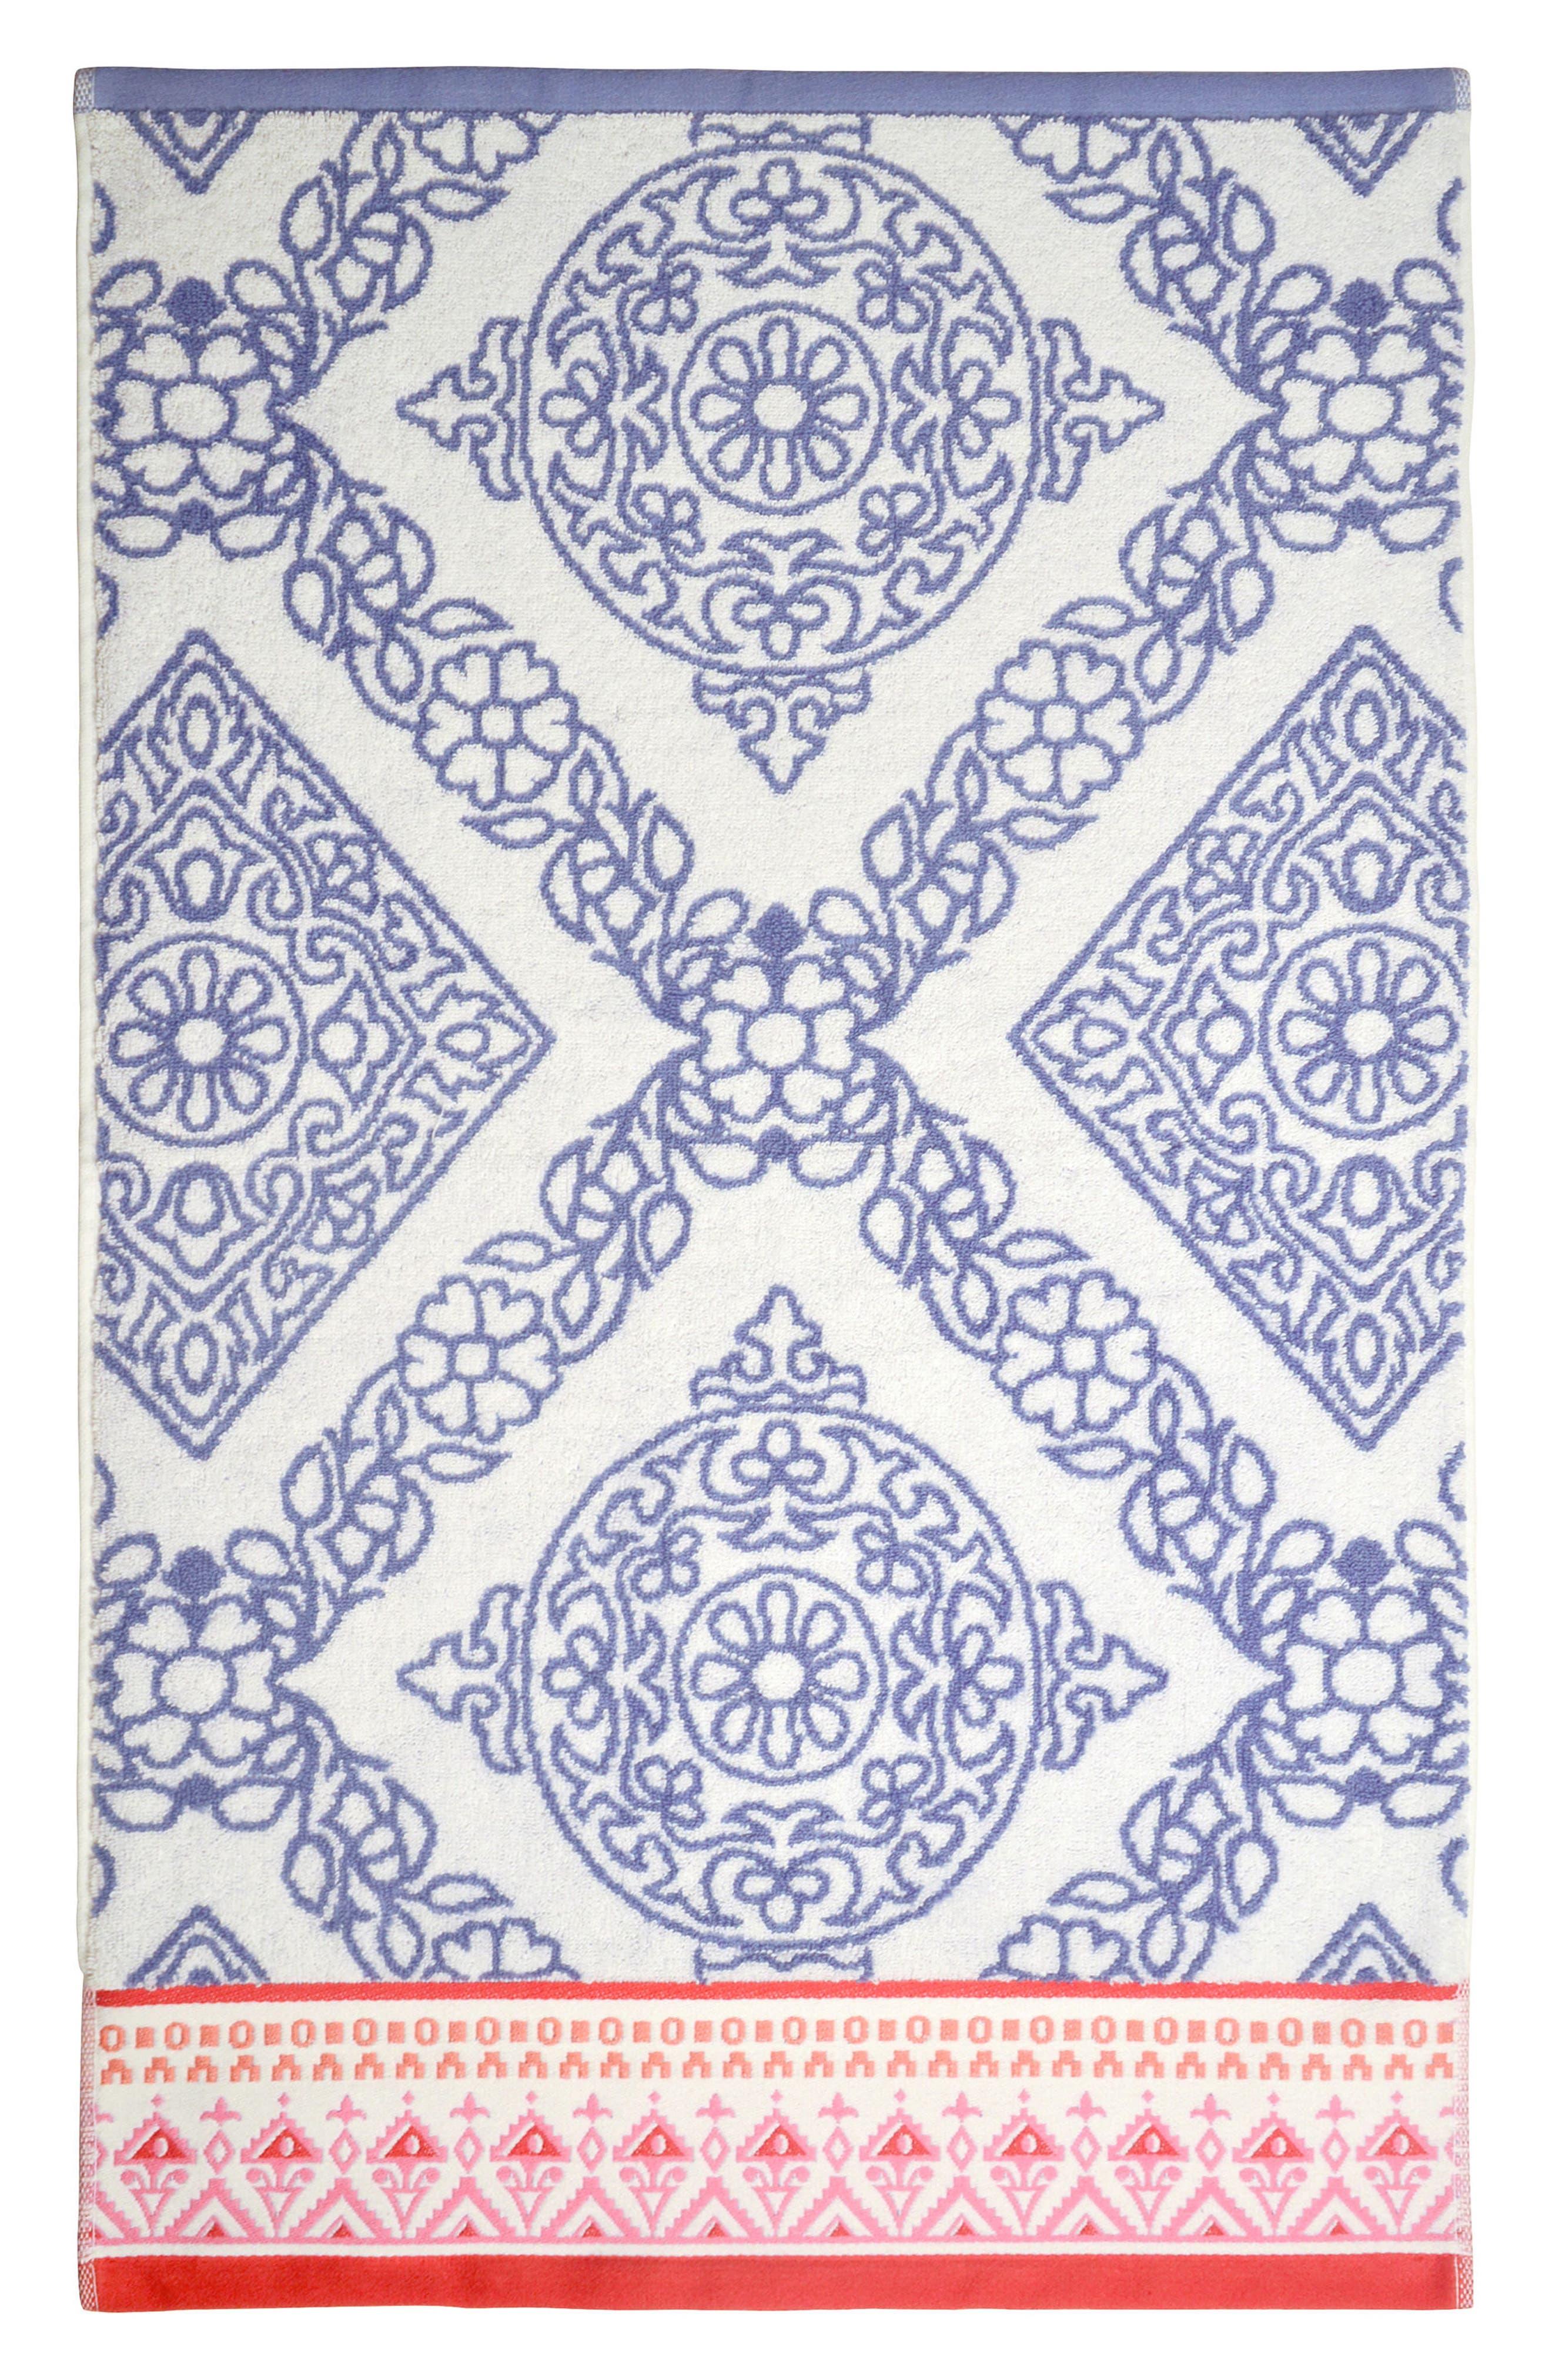 Alternate Image 1 Selected - John Robshaw Mitta Hand Towel